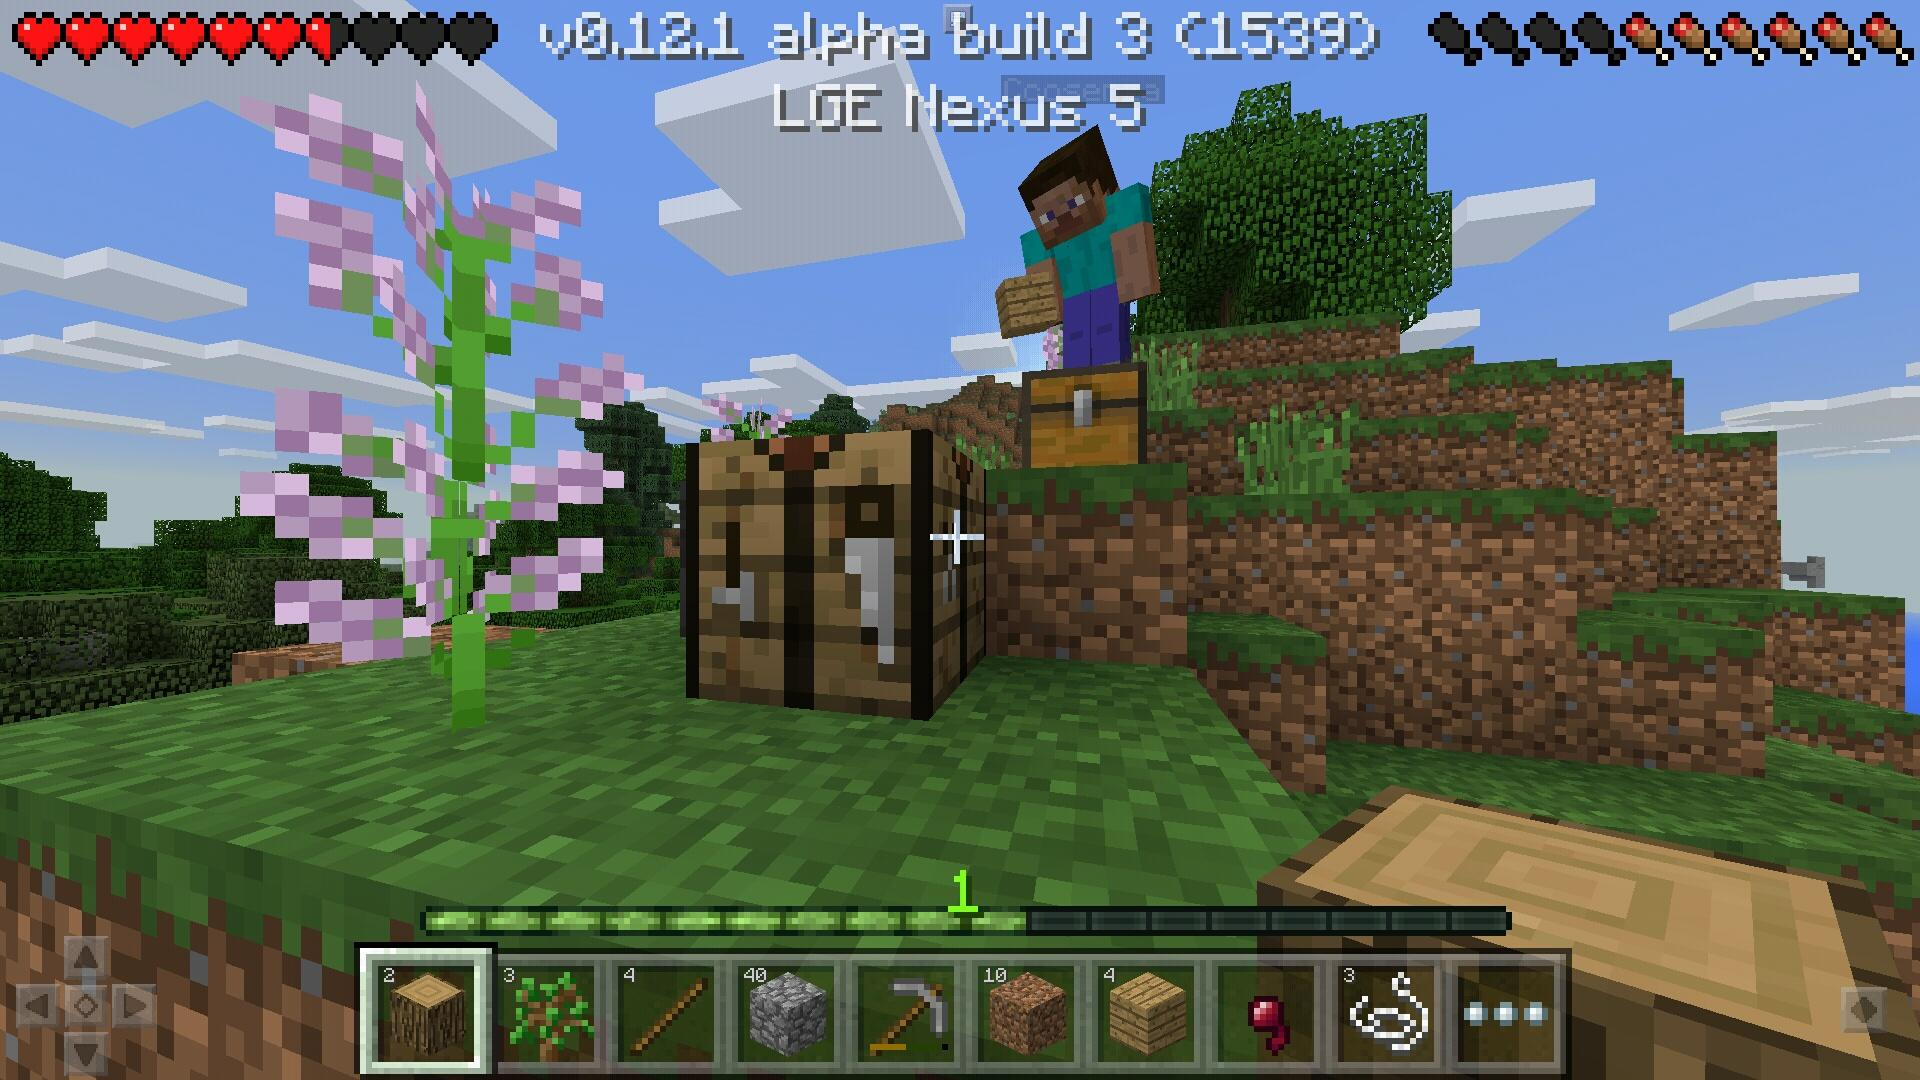 MCPE-9664] Placing blocks on interactive blocks while